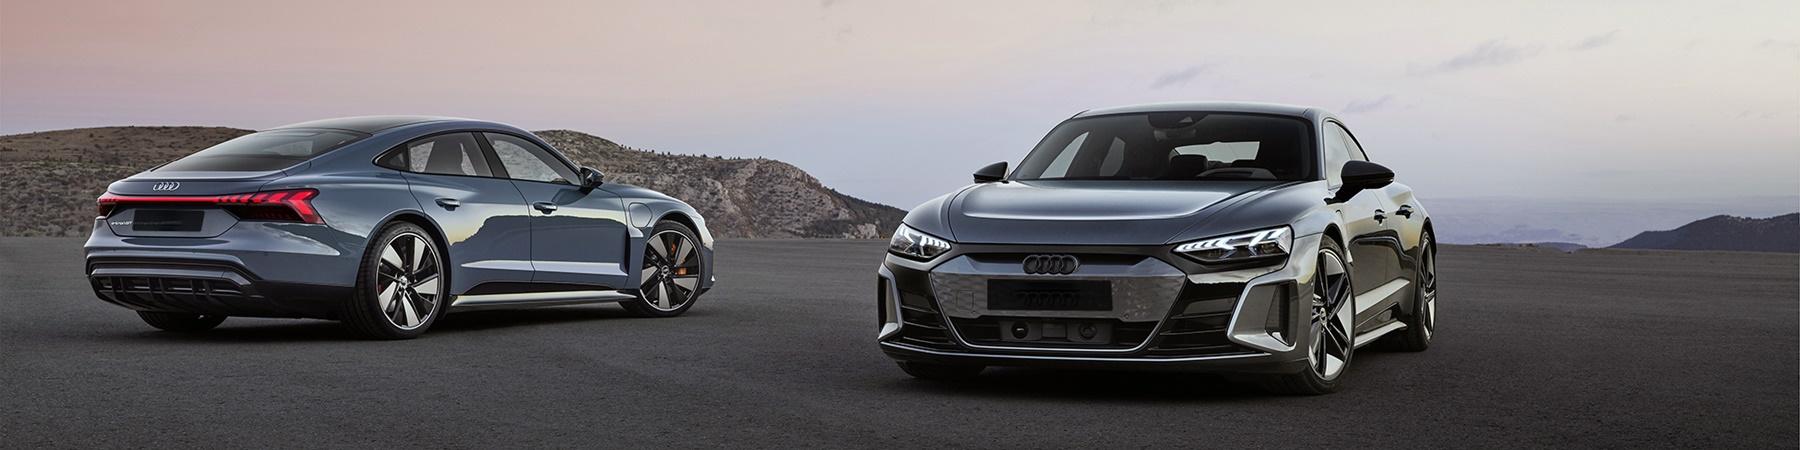 Audi E-tron GT 93kWh 407 km actieradius